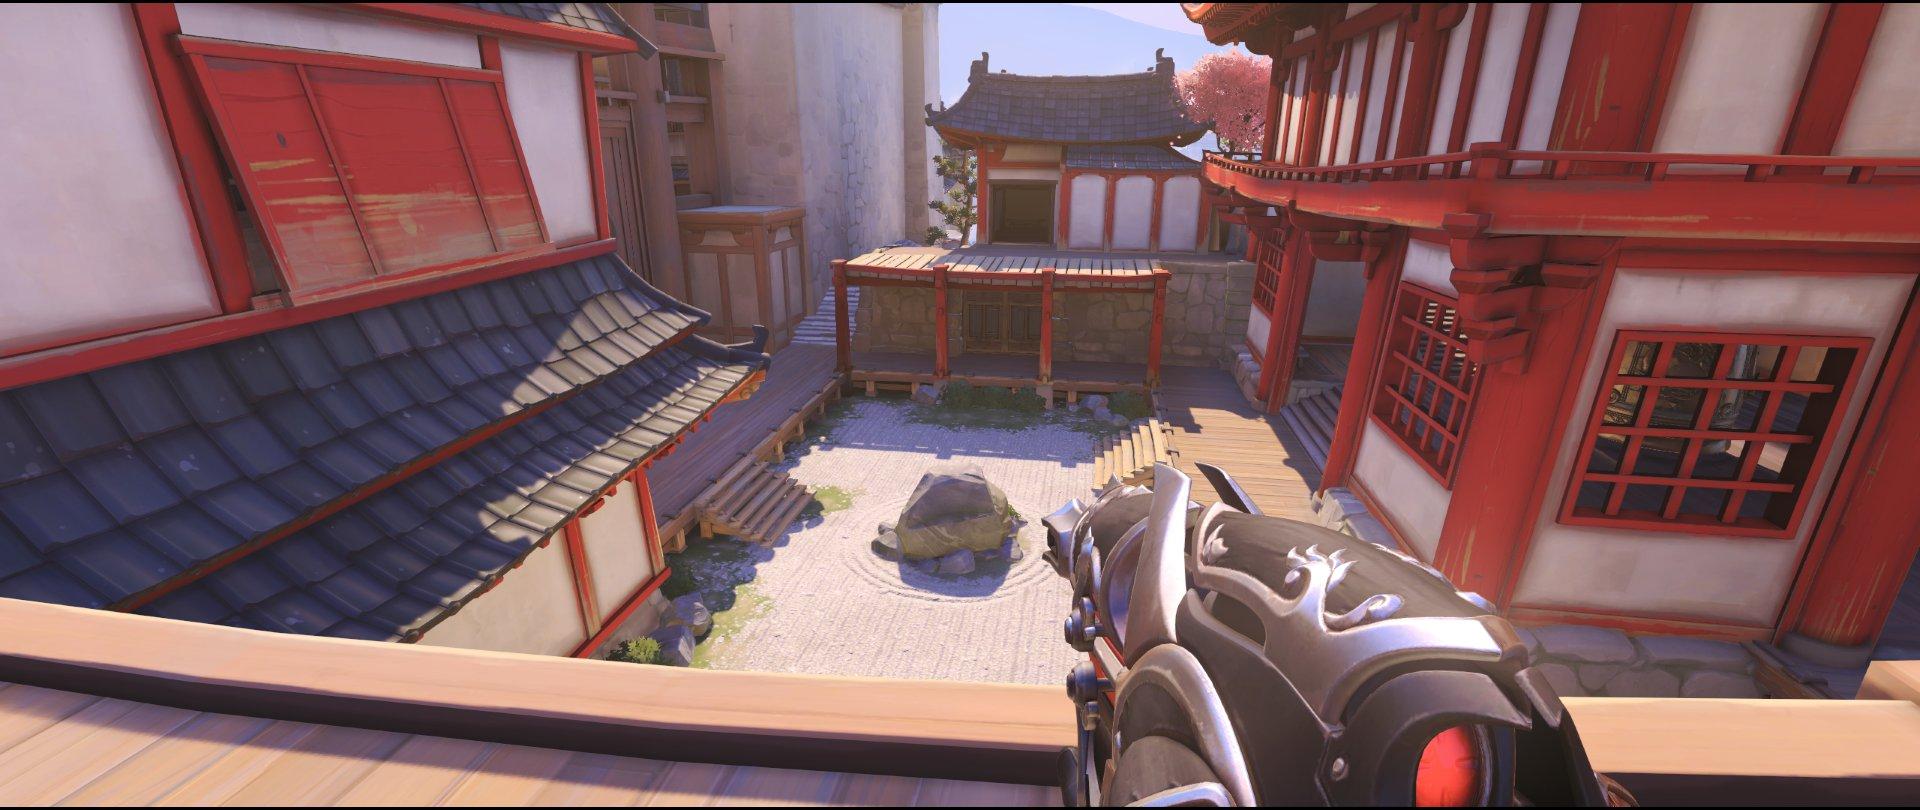 Bridge view defense Widowmaker sniping spot Hanamura Overwatch.jpg